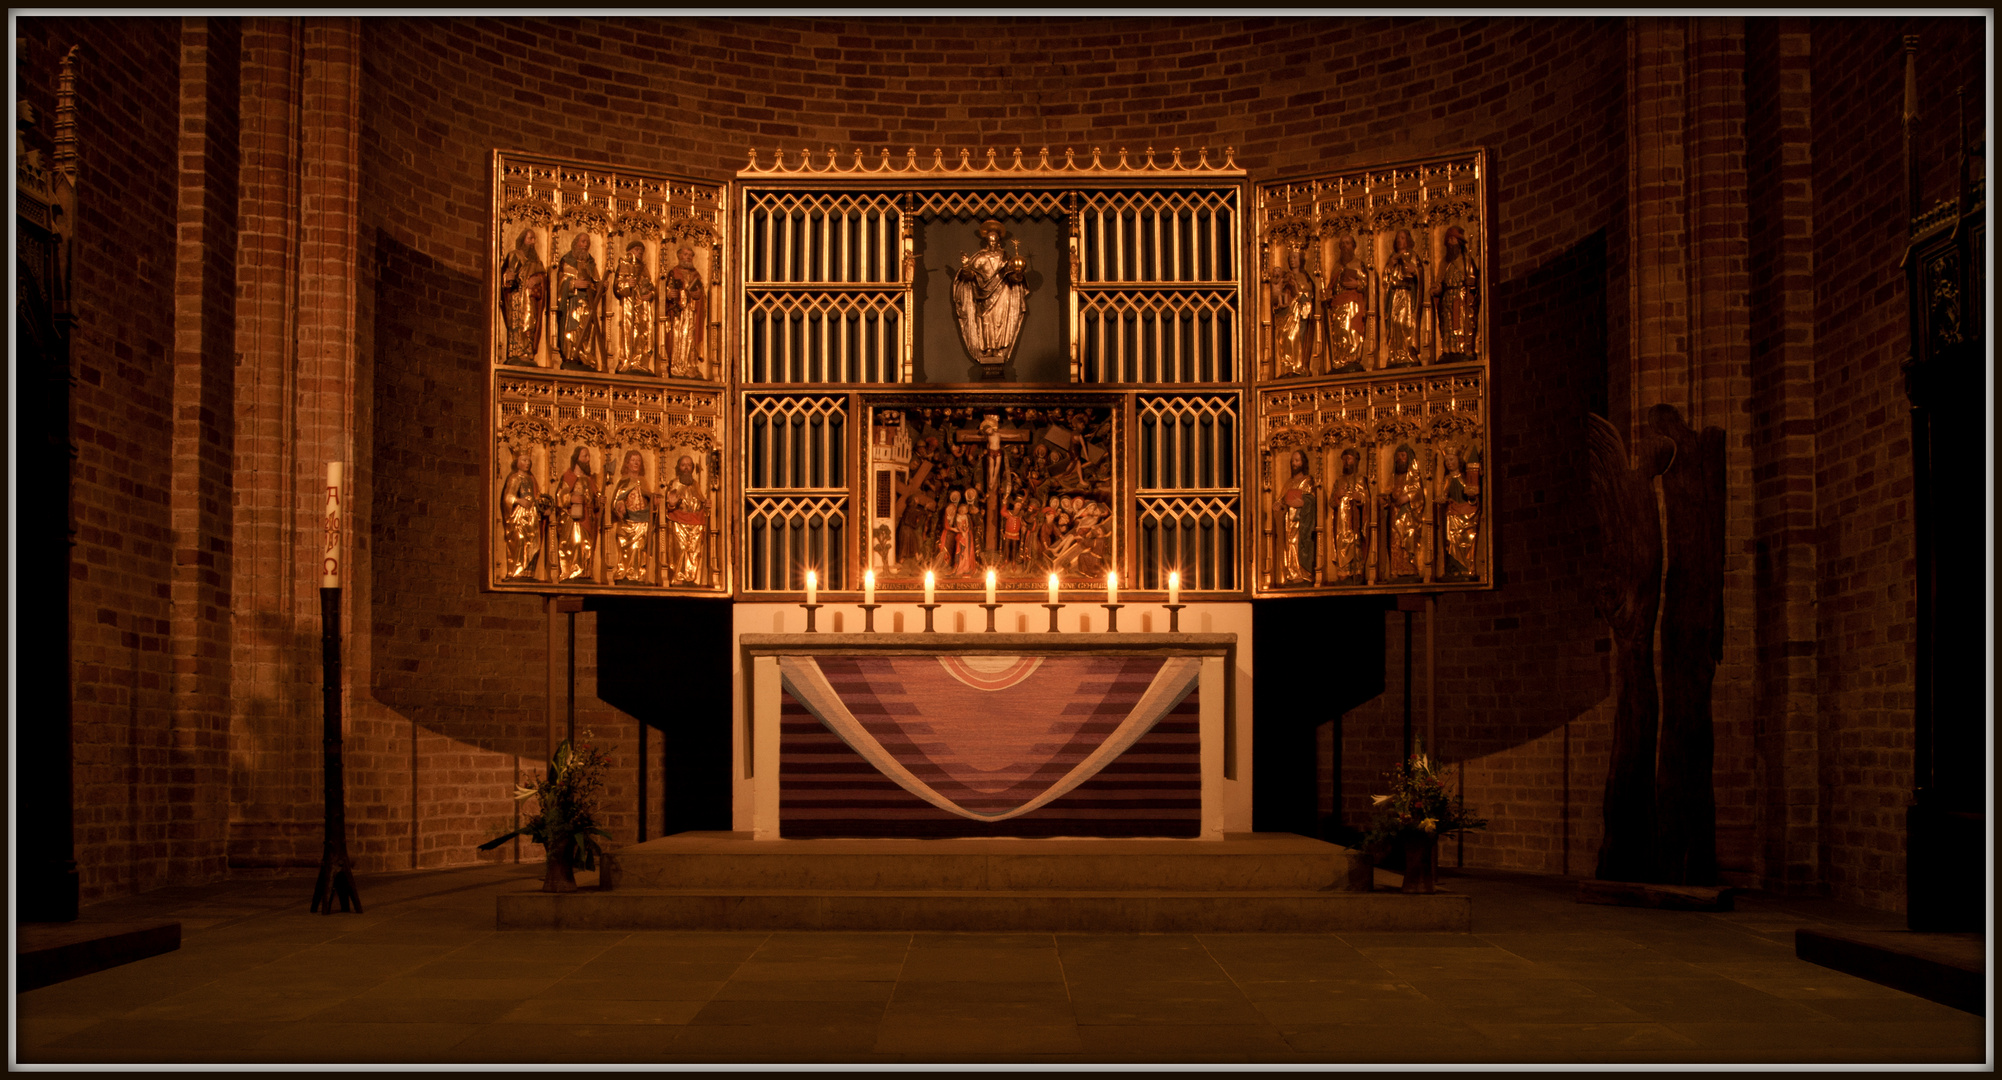 Altar des Ratzeburger Dom